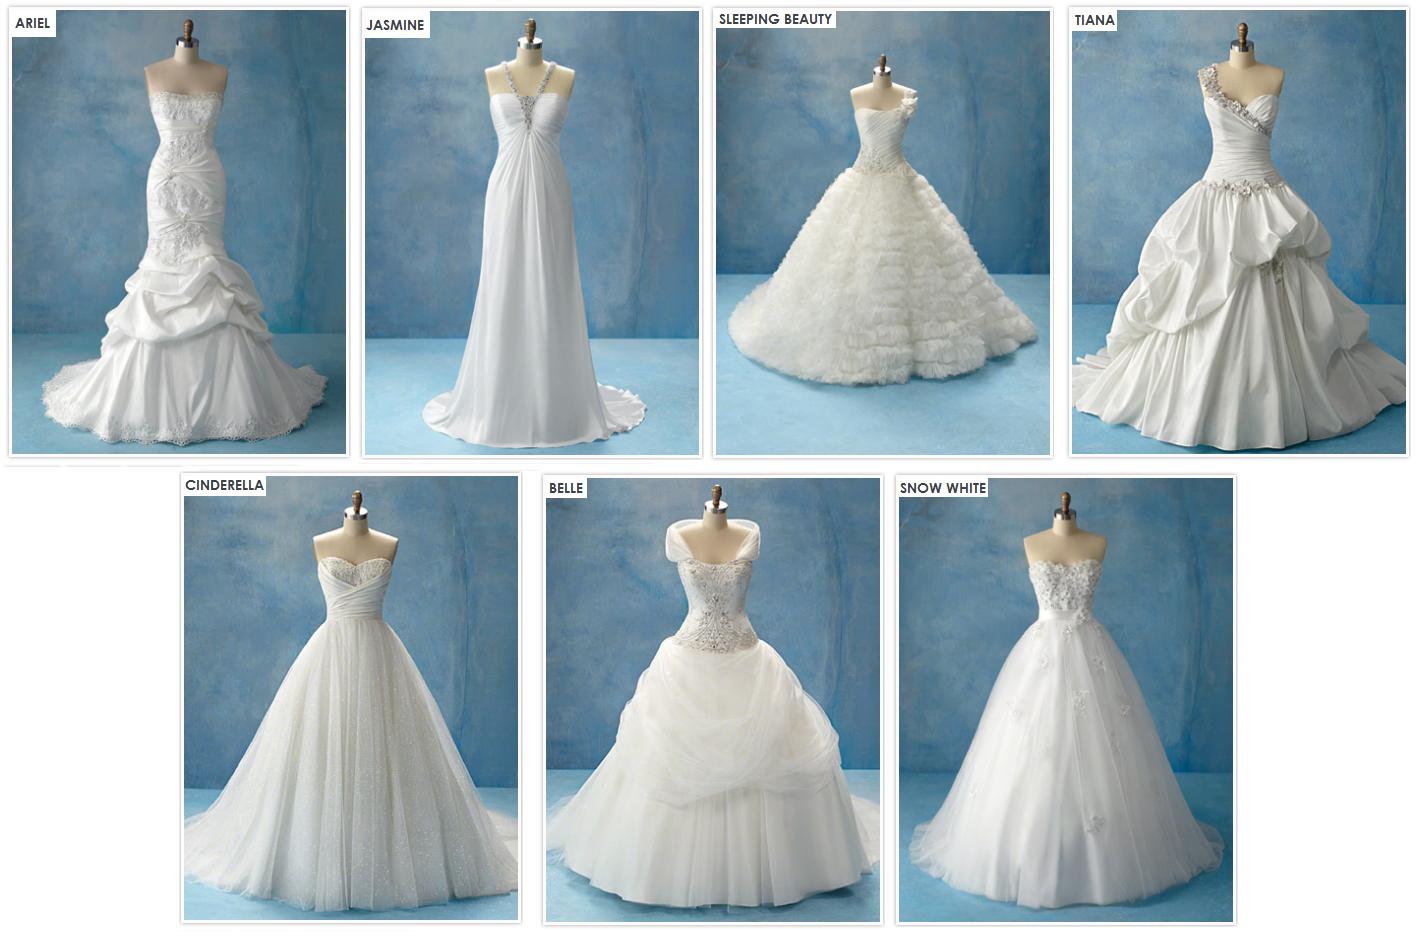 Disney Princess Wedding Dresses   Dream Wedding IdeaS Around The World